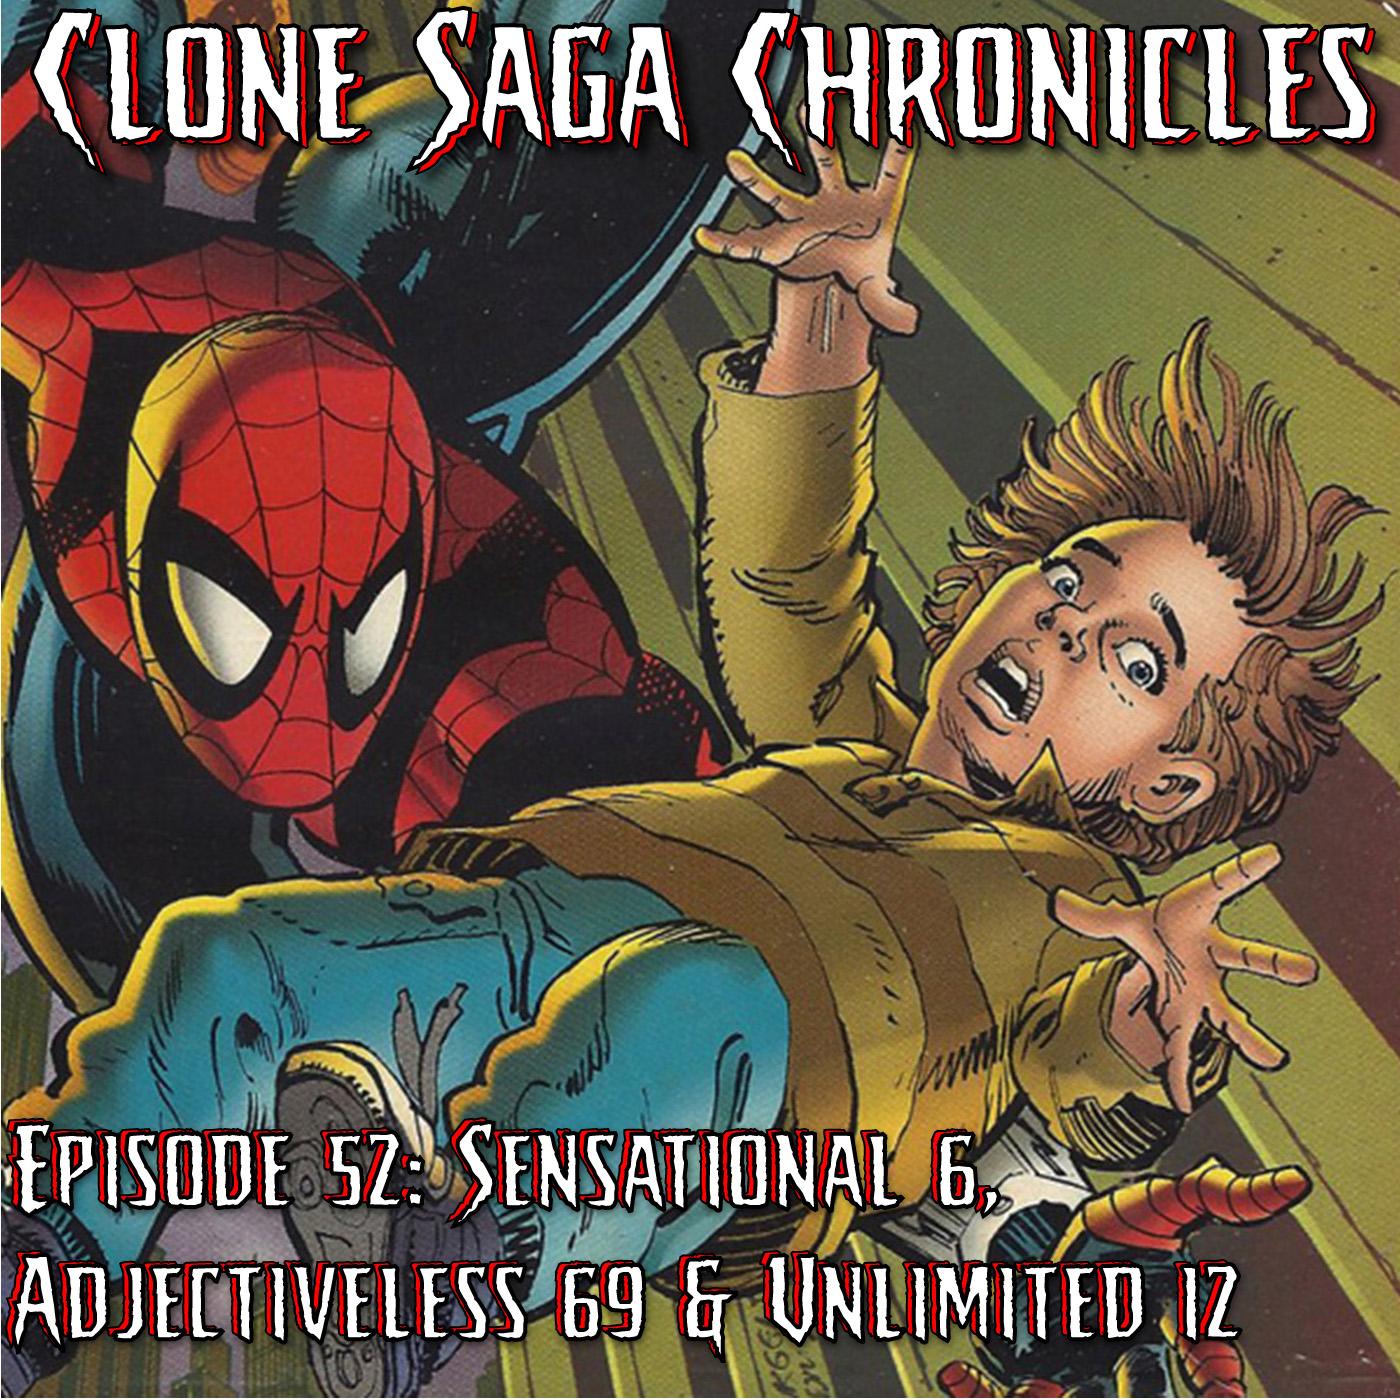 CSC Episode 52: Sensational 6, Unlimited 12, Spider-Man 69.